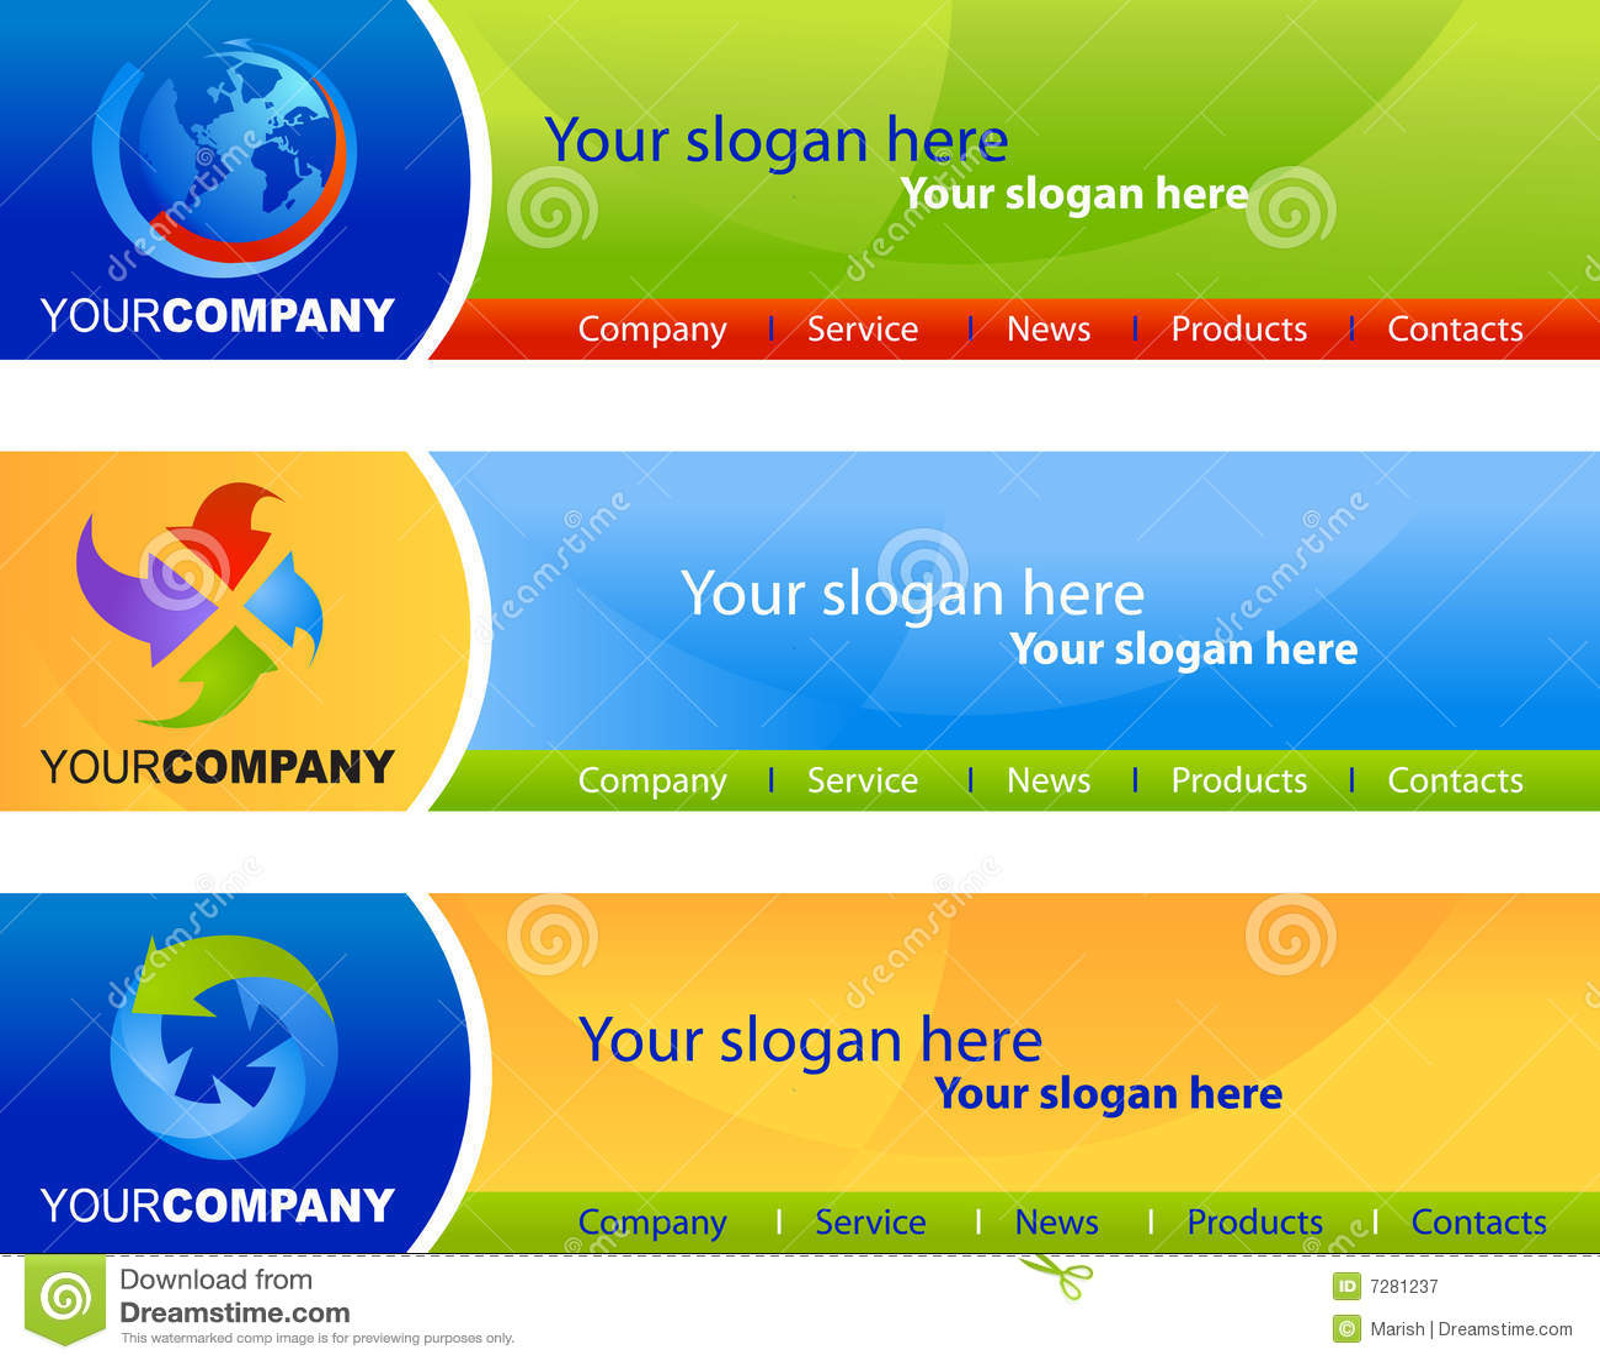 Royalty Free Website Templates. illustration of eco website ...